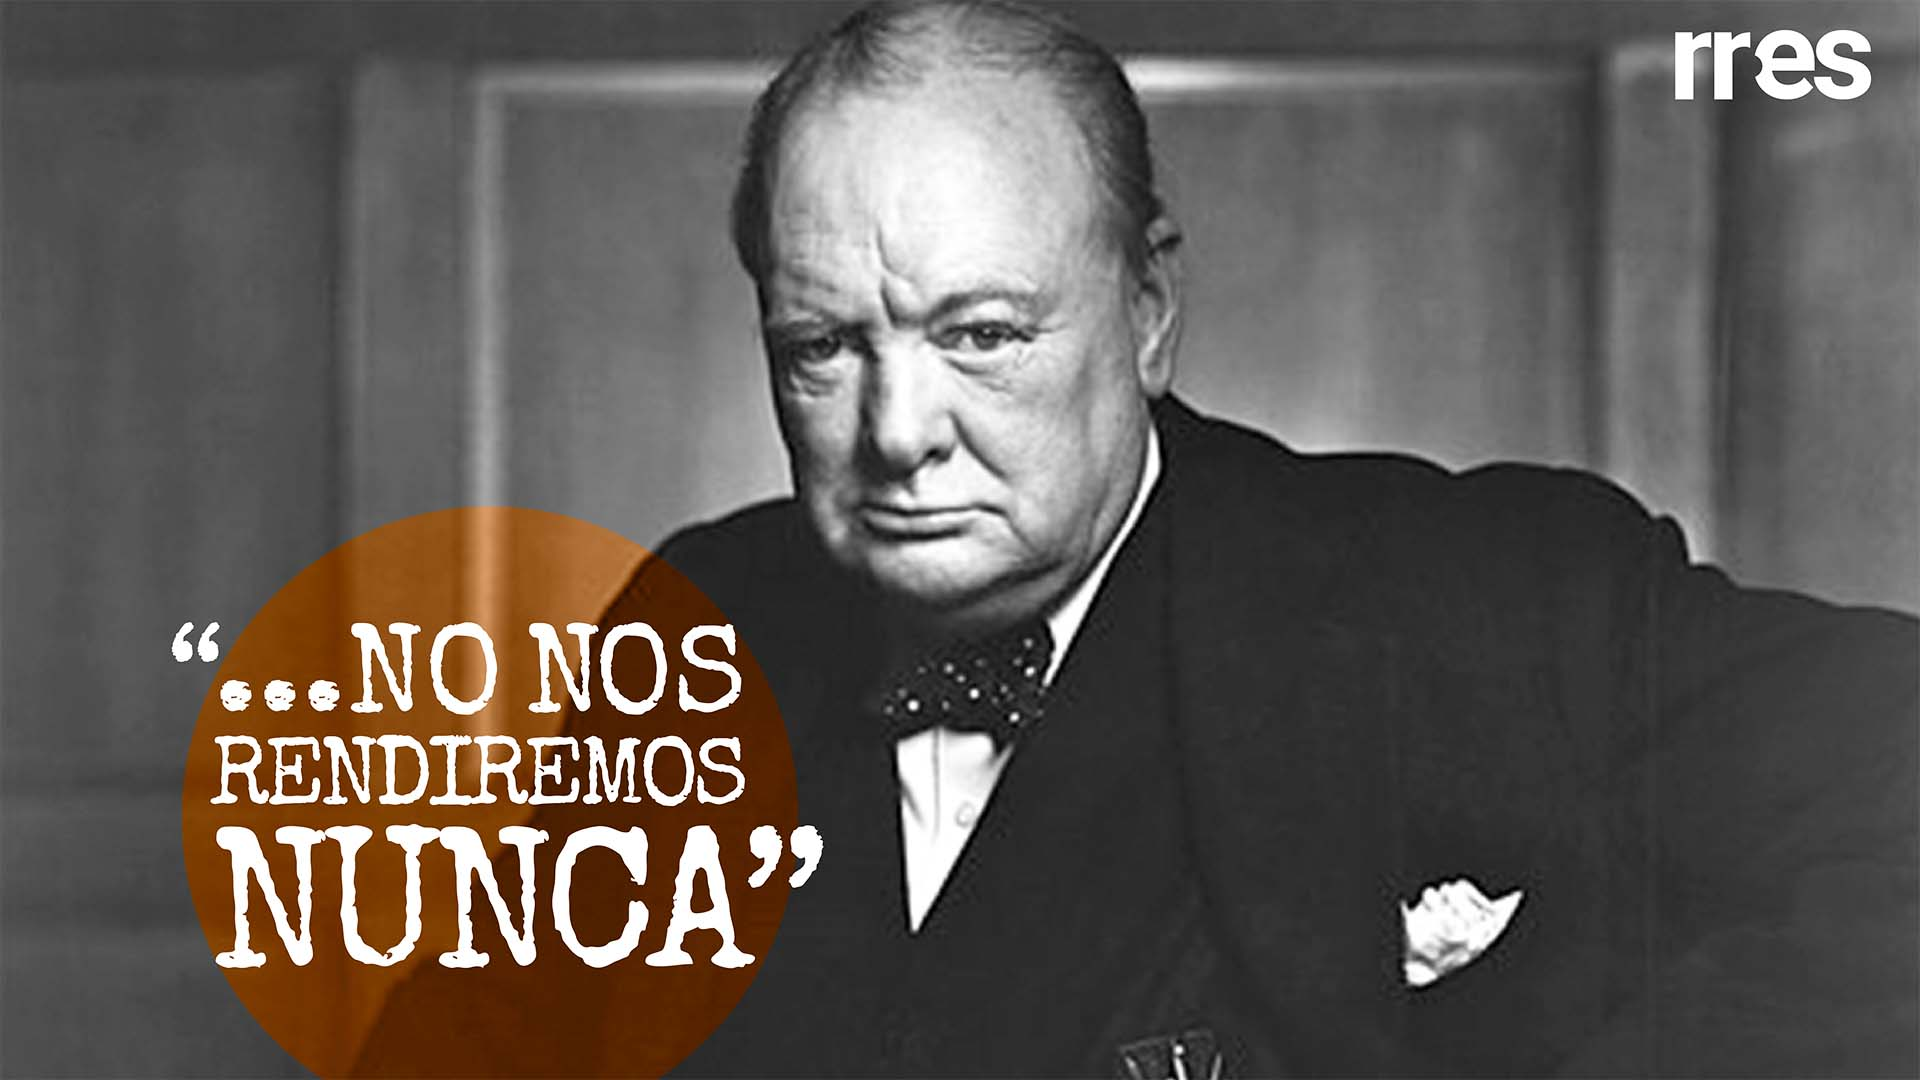 Del Dr. Pangloss a Sir Winston Churchill, por Julio Castillo Sagarzazu